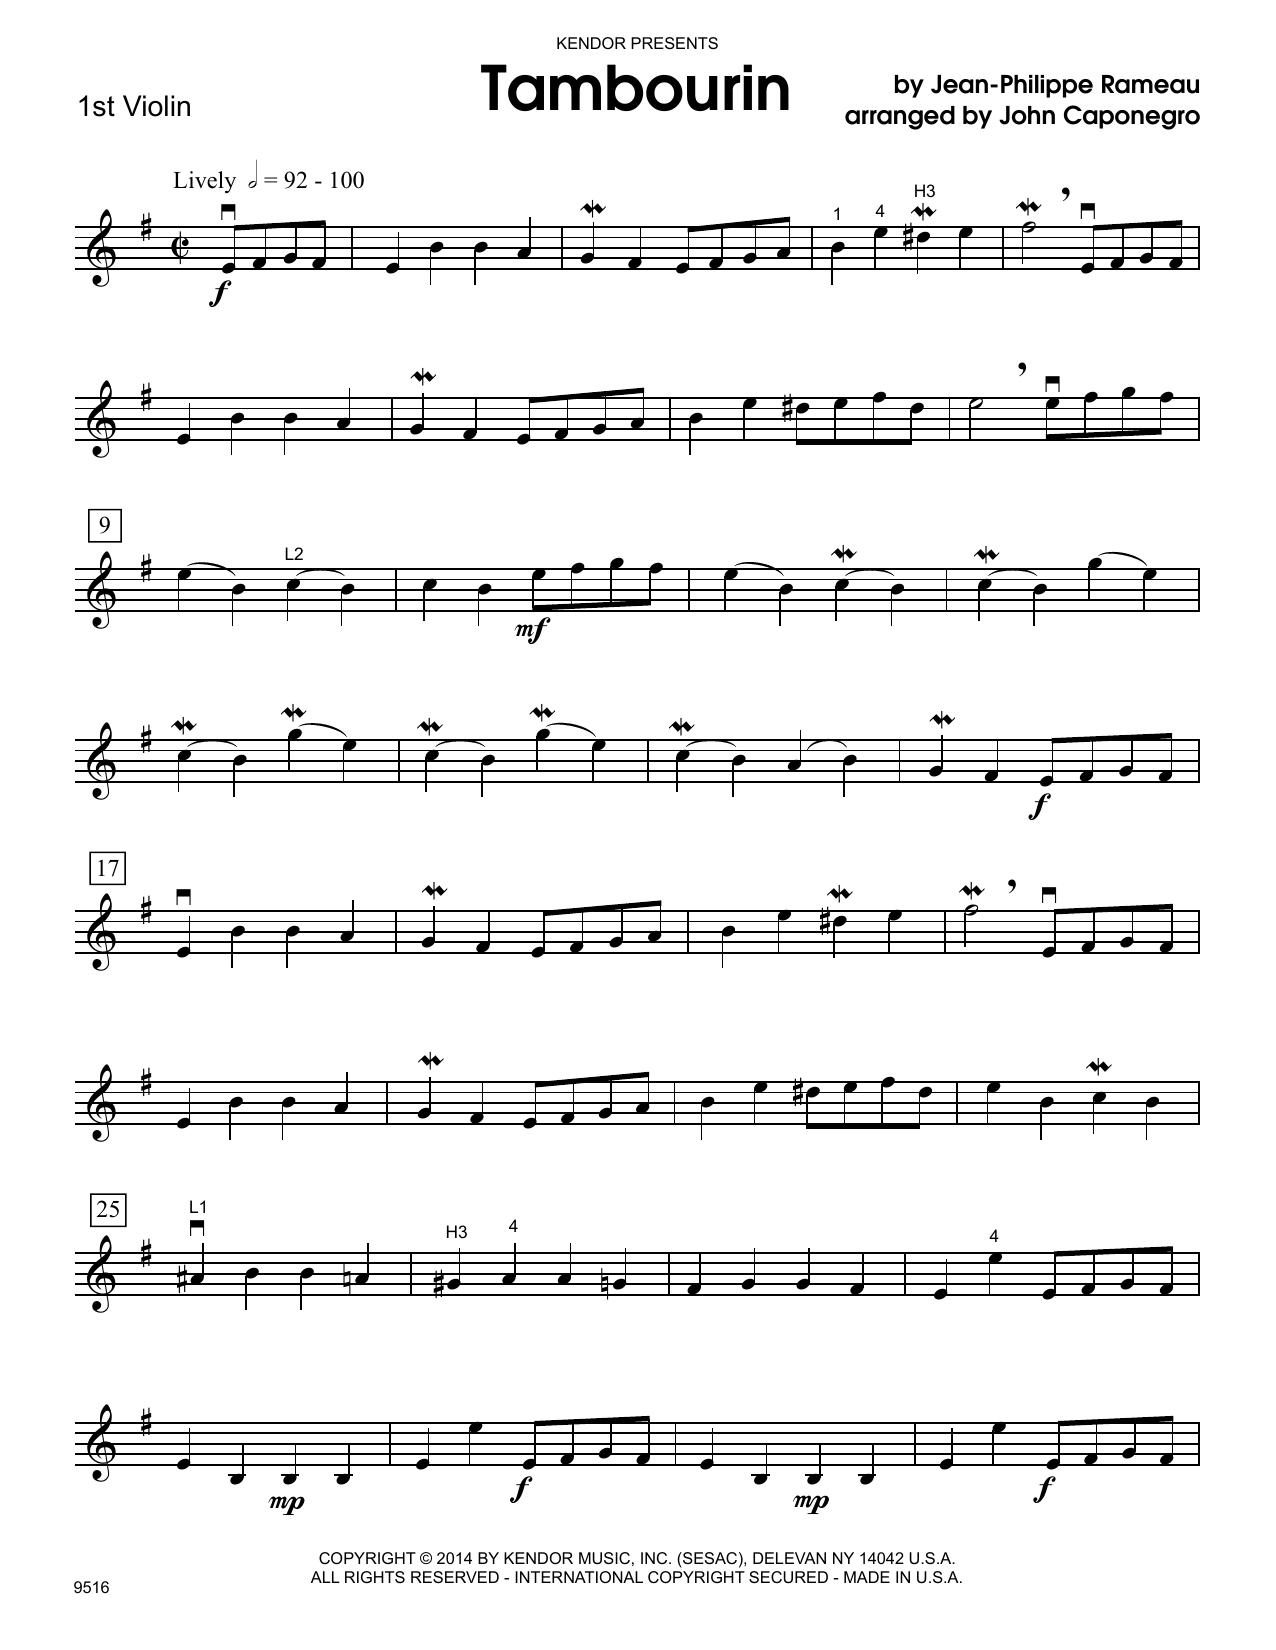 Tambourin - 1st Violin